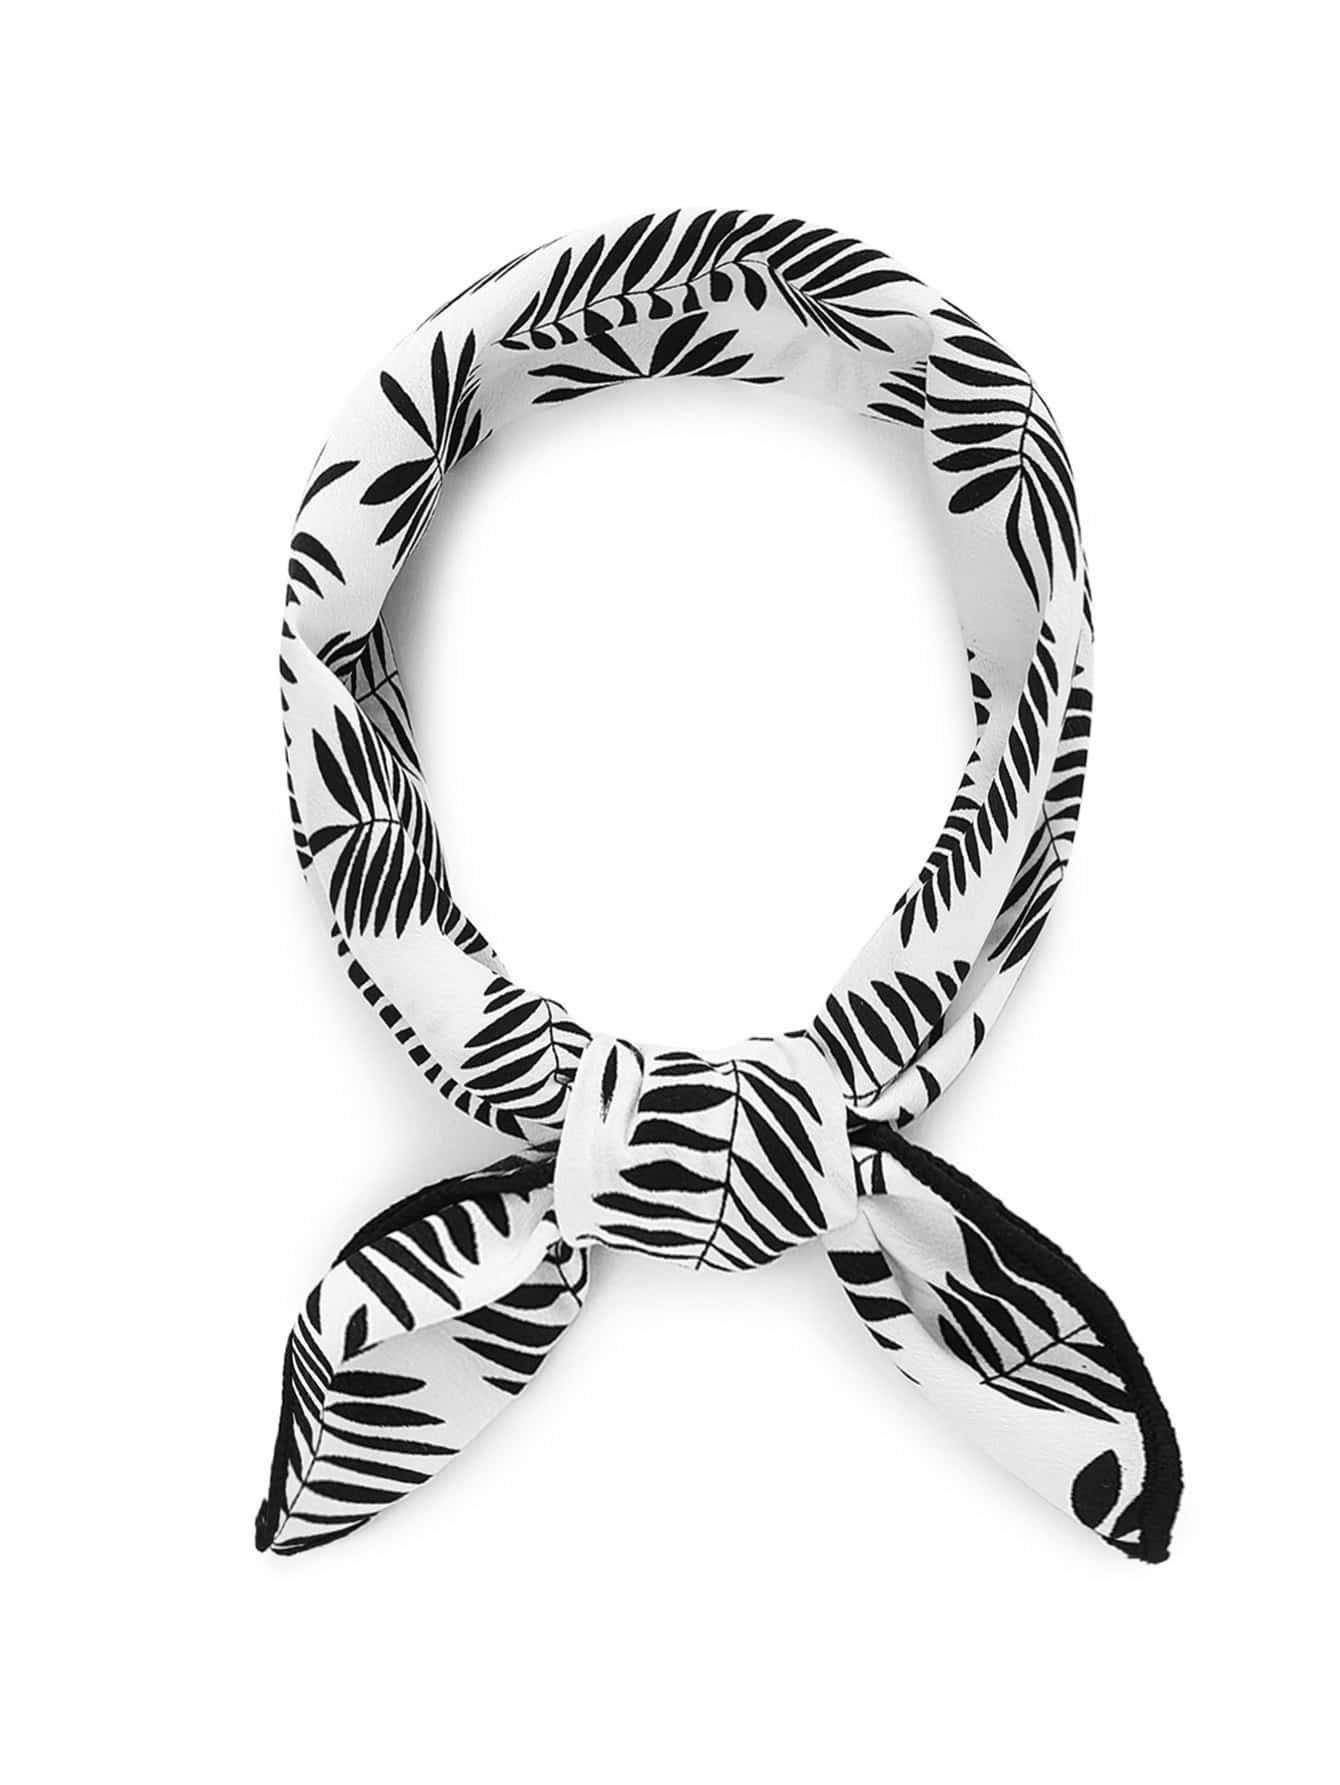 Leaf Print Bandana Scarf calico print satin bandana